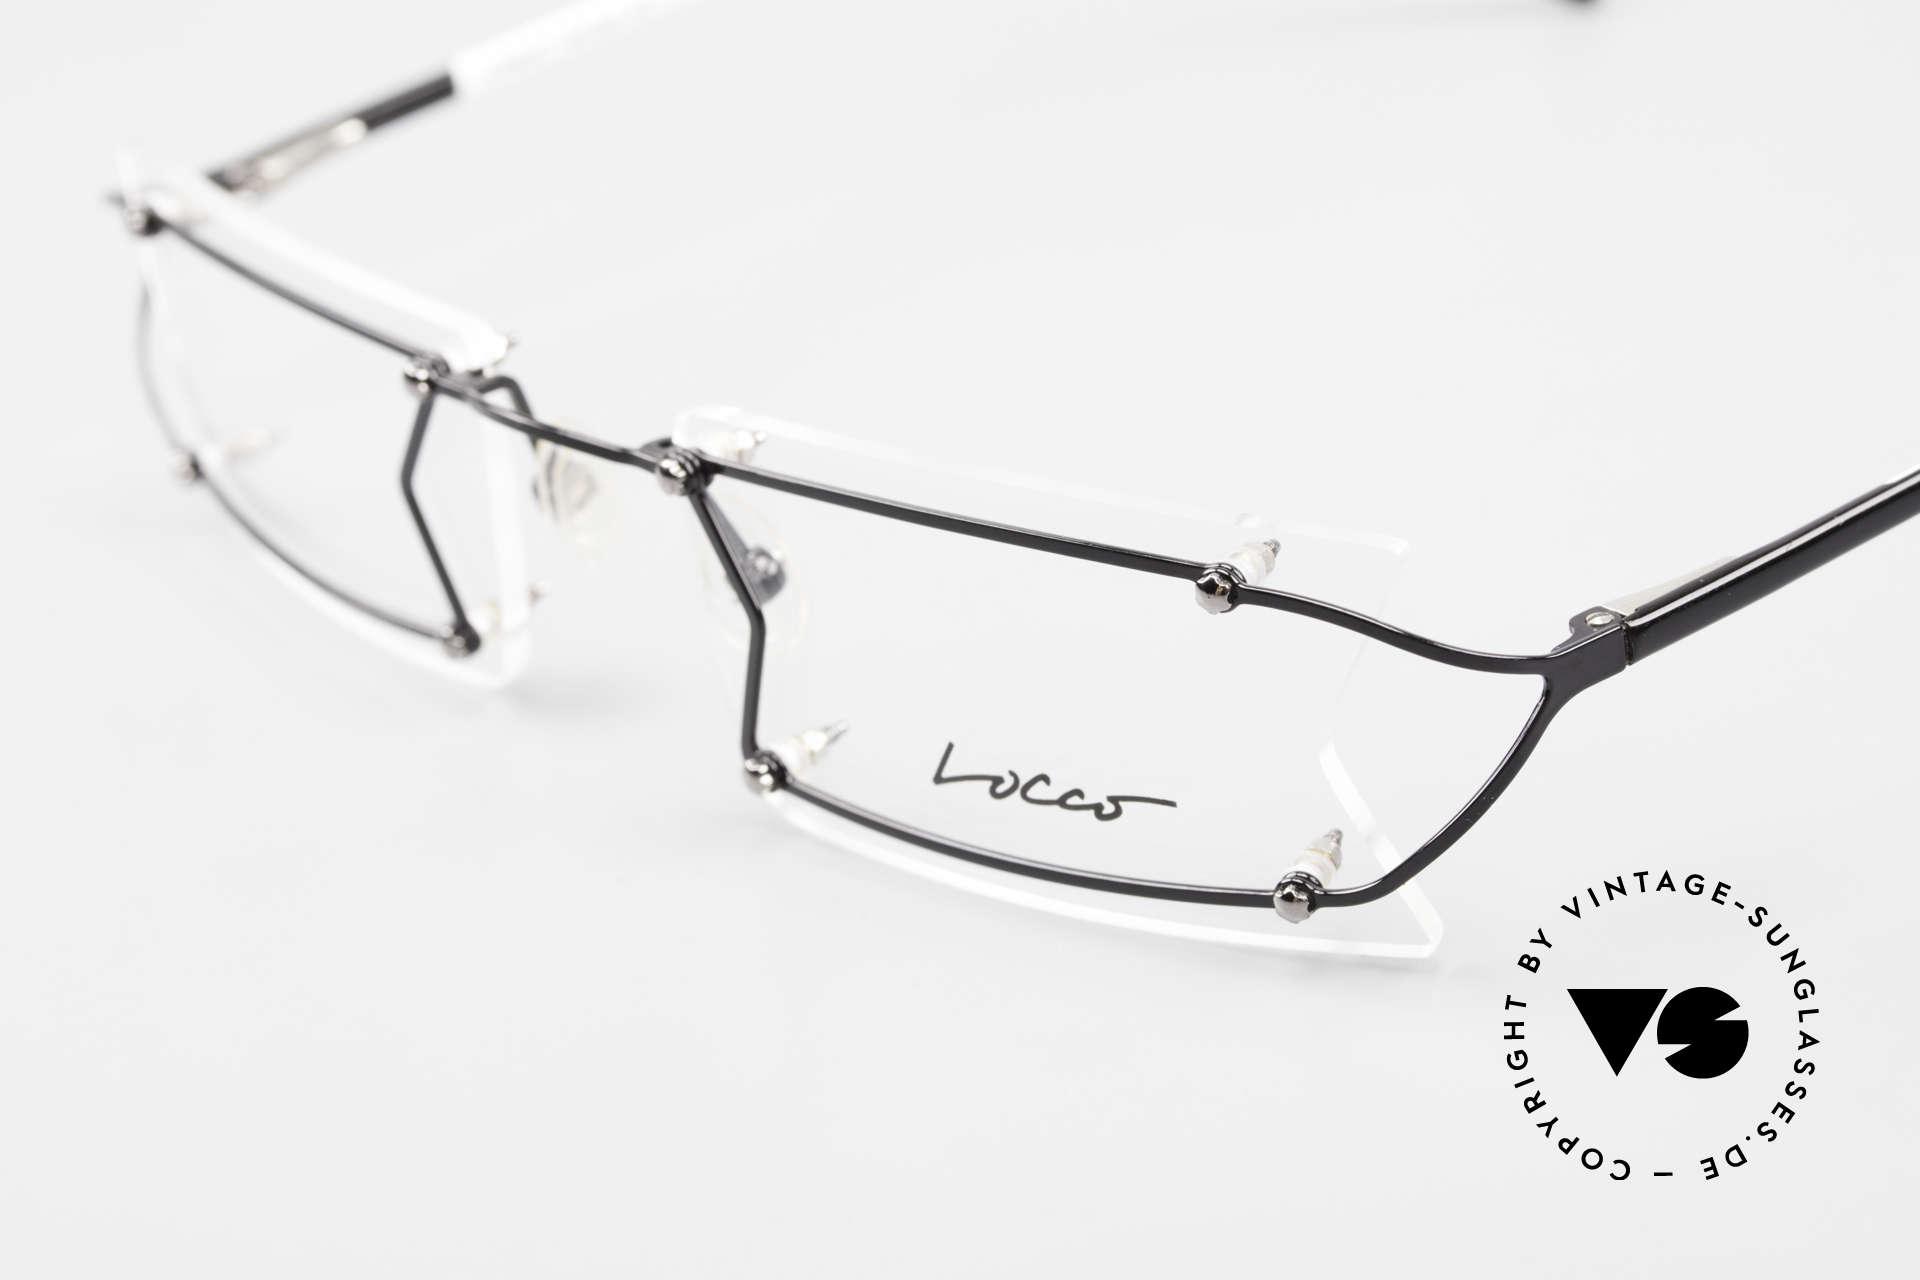 Locco Pinot Crazy 90's Rimless Eyeglasses, NO RETRO eyeglasses, but an old 1990's ORIGINAL, Made for Men and Women